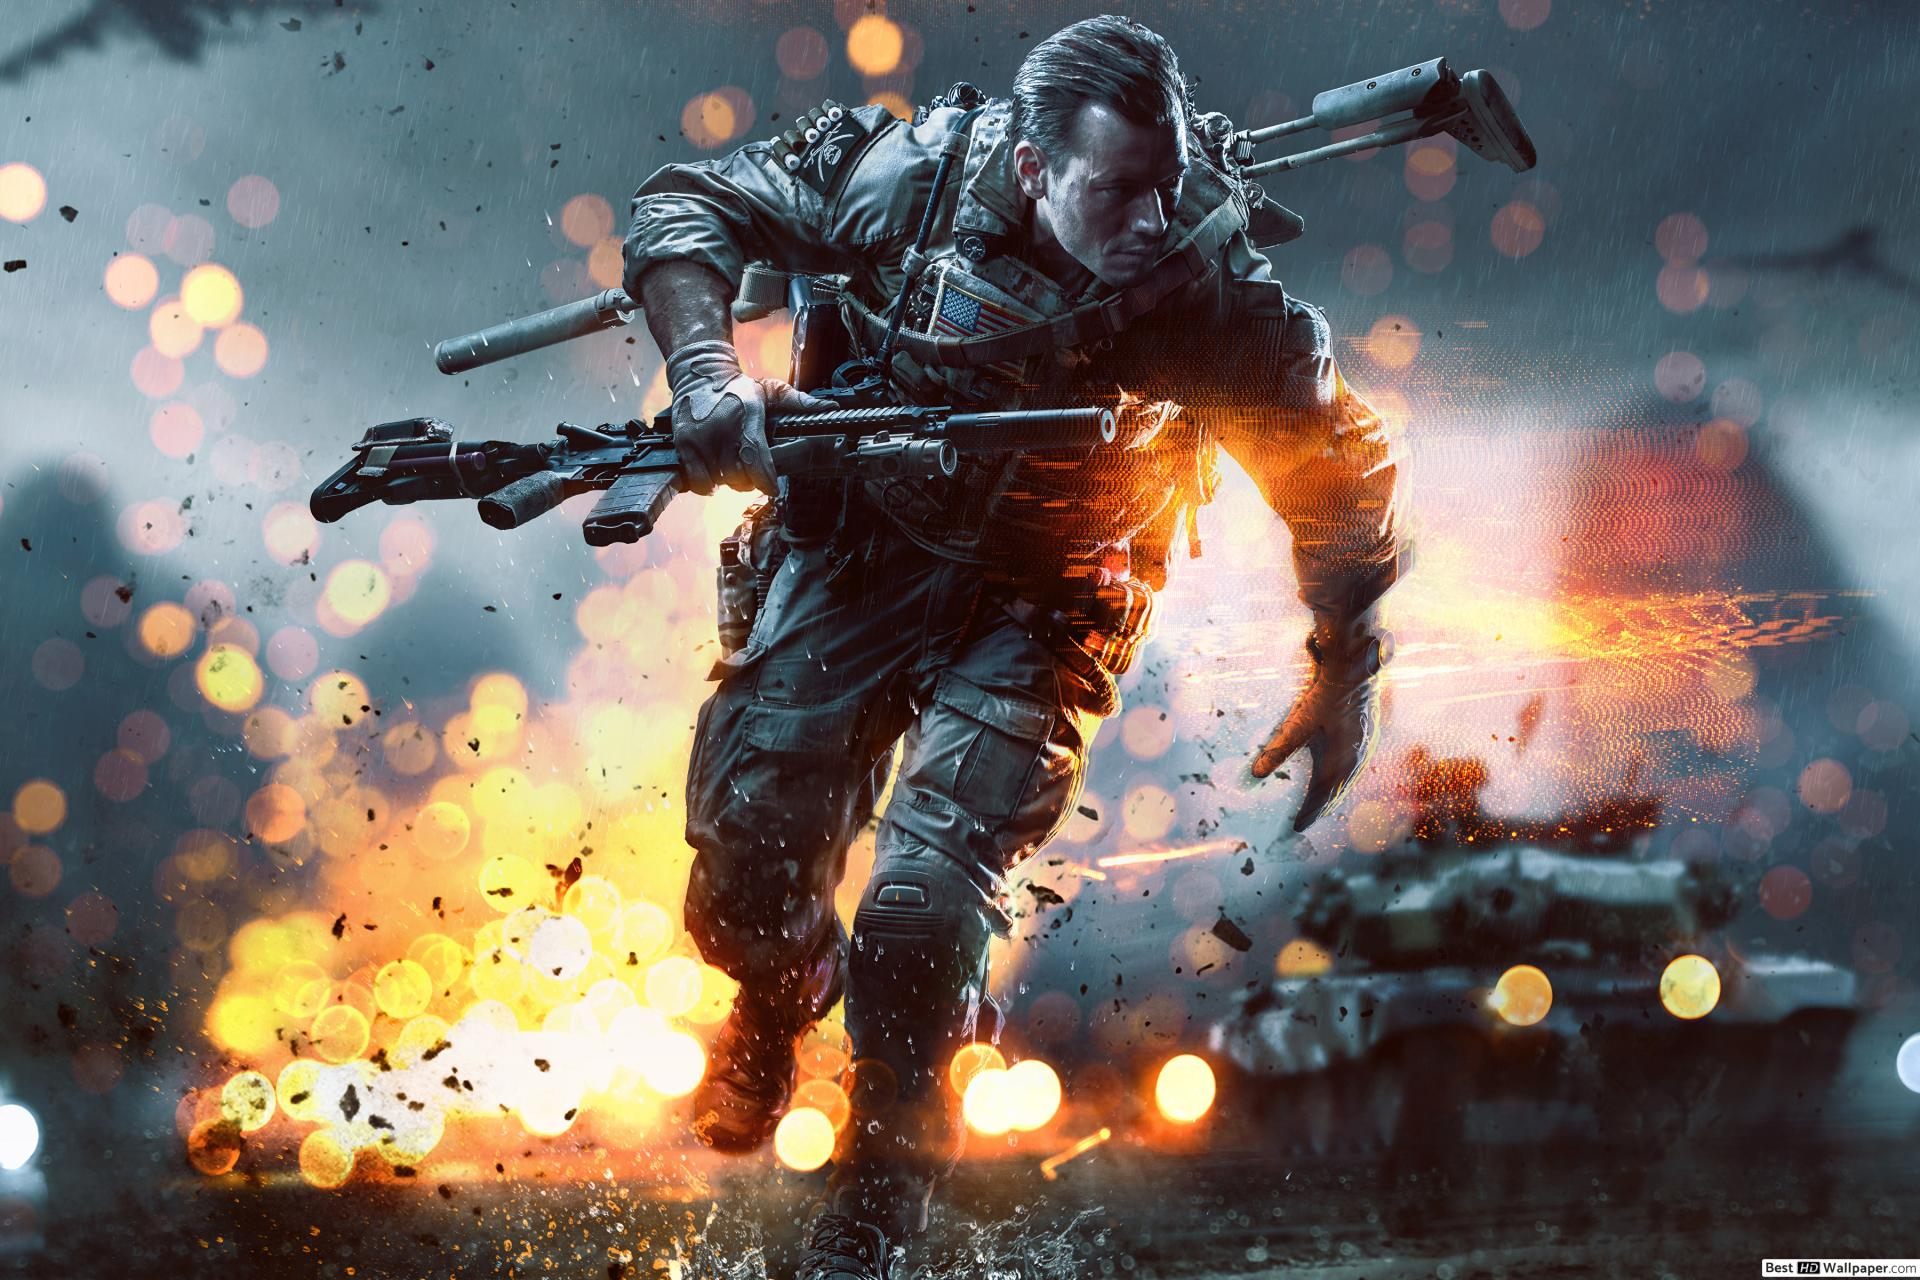 Próximo Battlefield pode ter elementos futuristas [rumor]